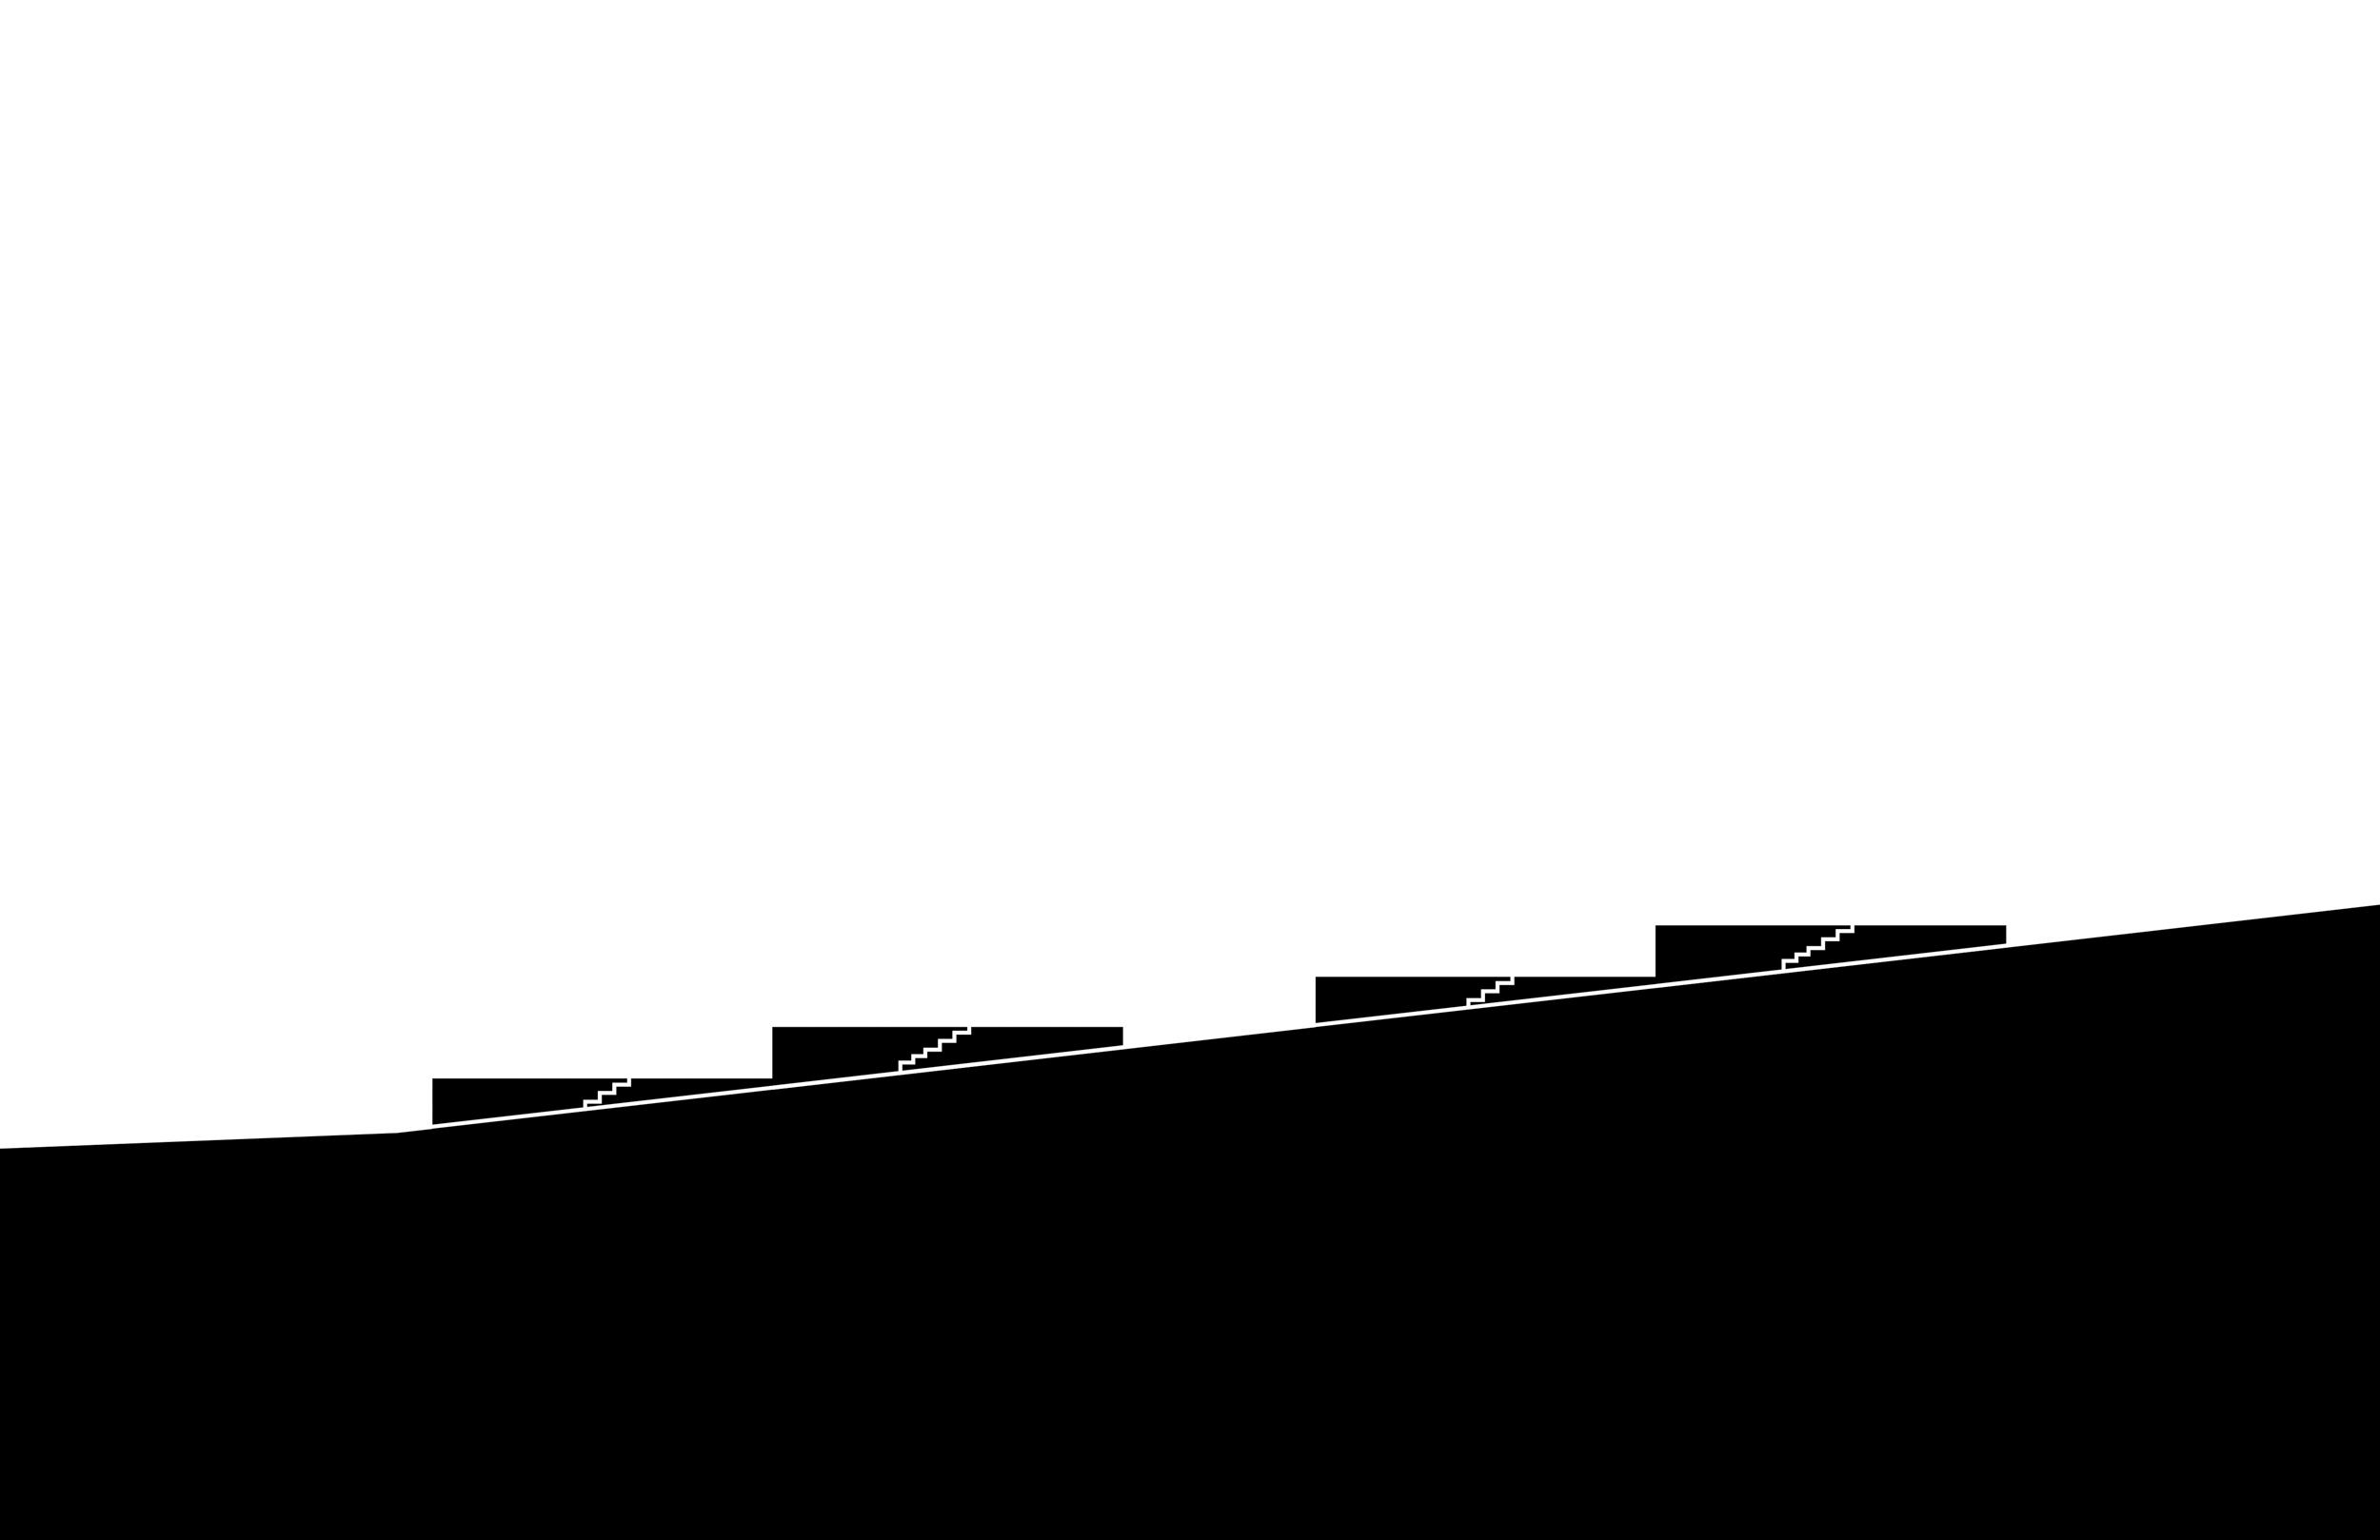 2302 G STREET - Diagram 2.jpg